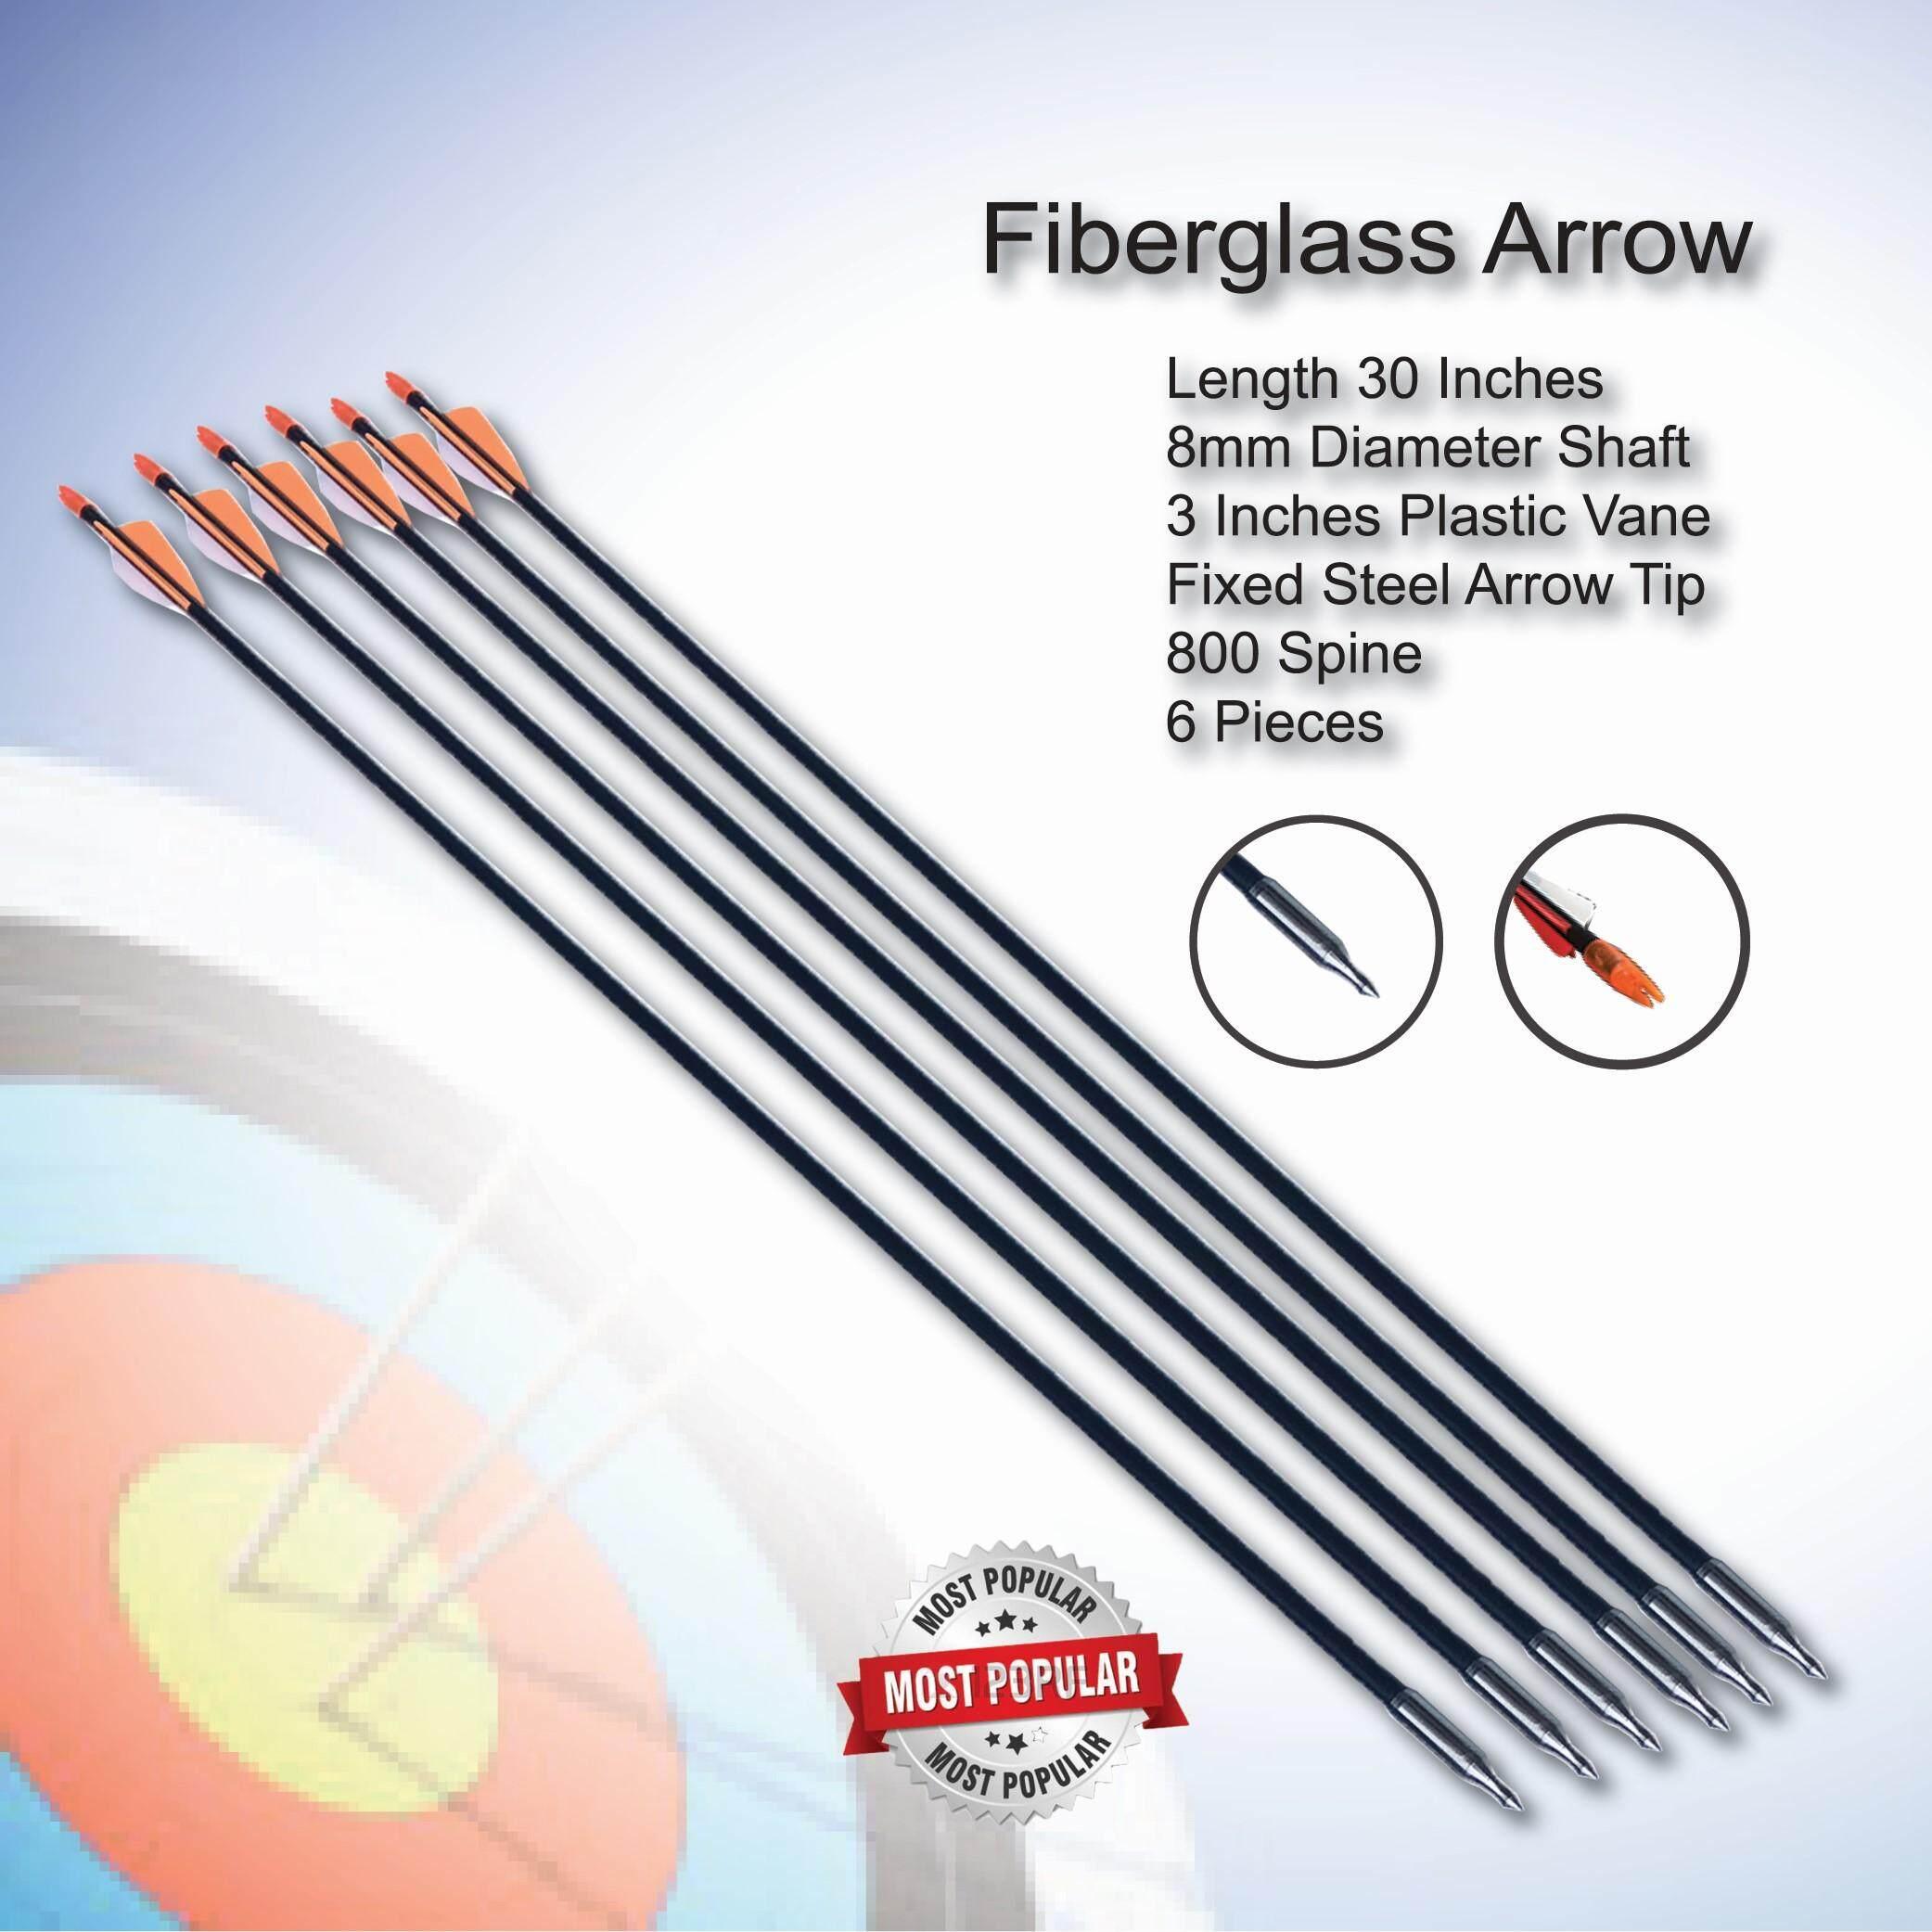 Archery Fiberglass Arrow 30Inches With Plastic Vane Fletcher For Training